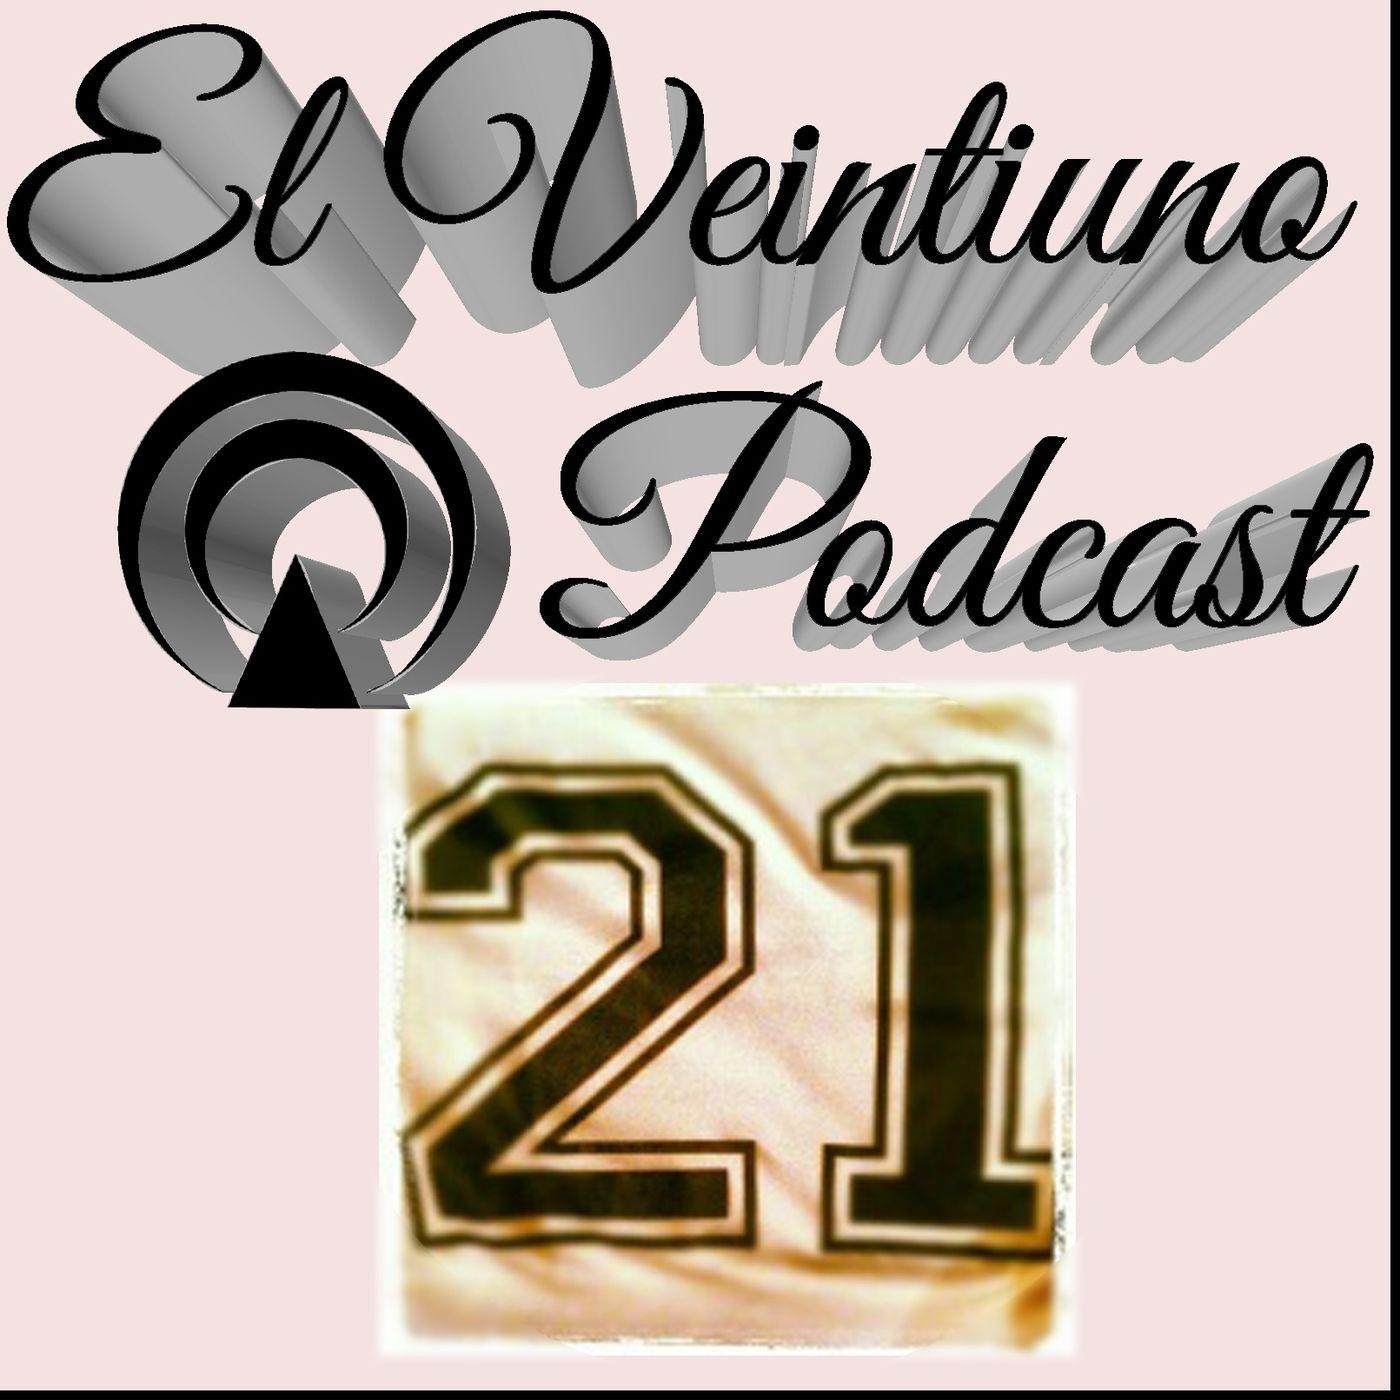 ElVeintiunoPodcast